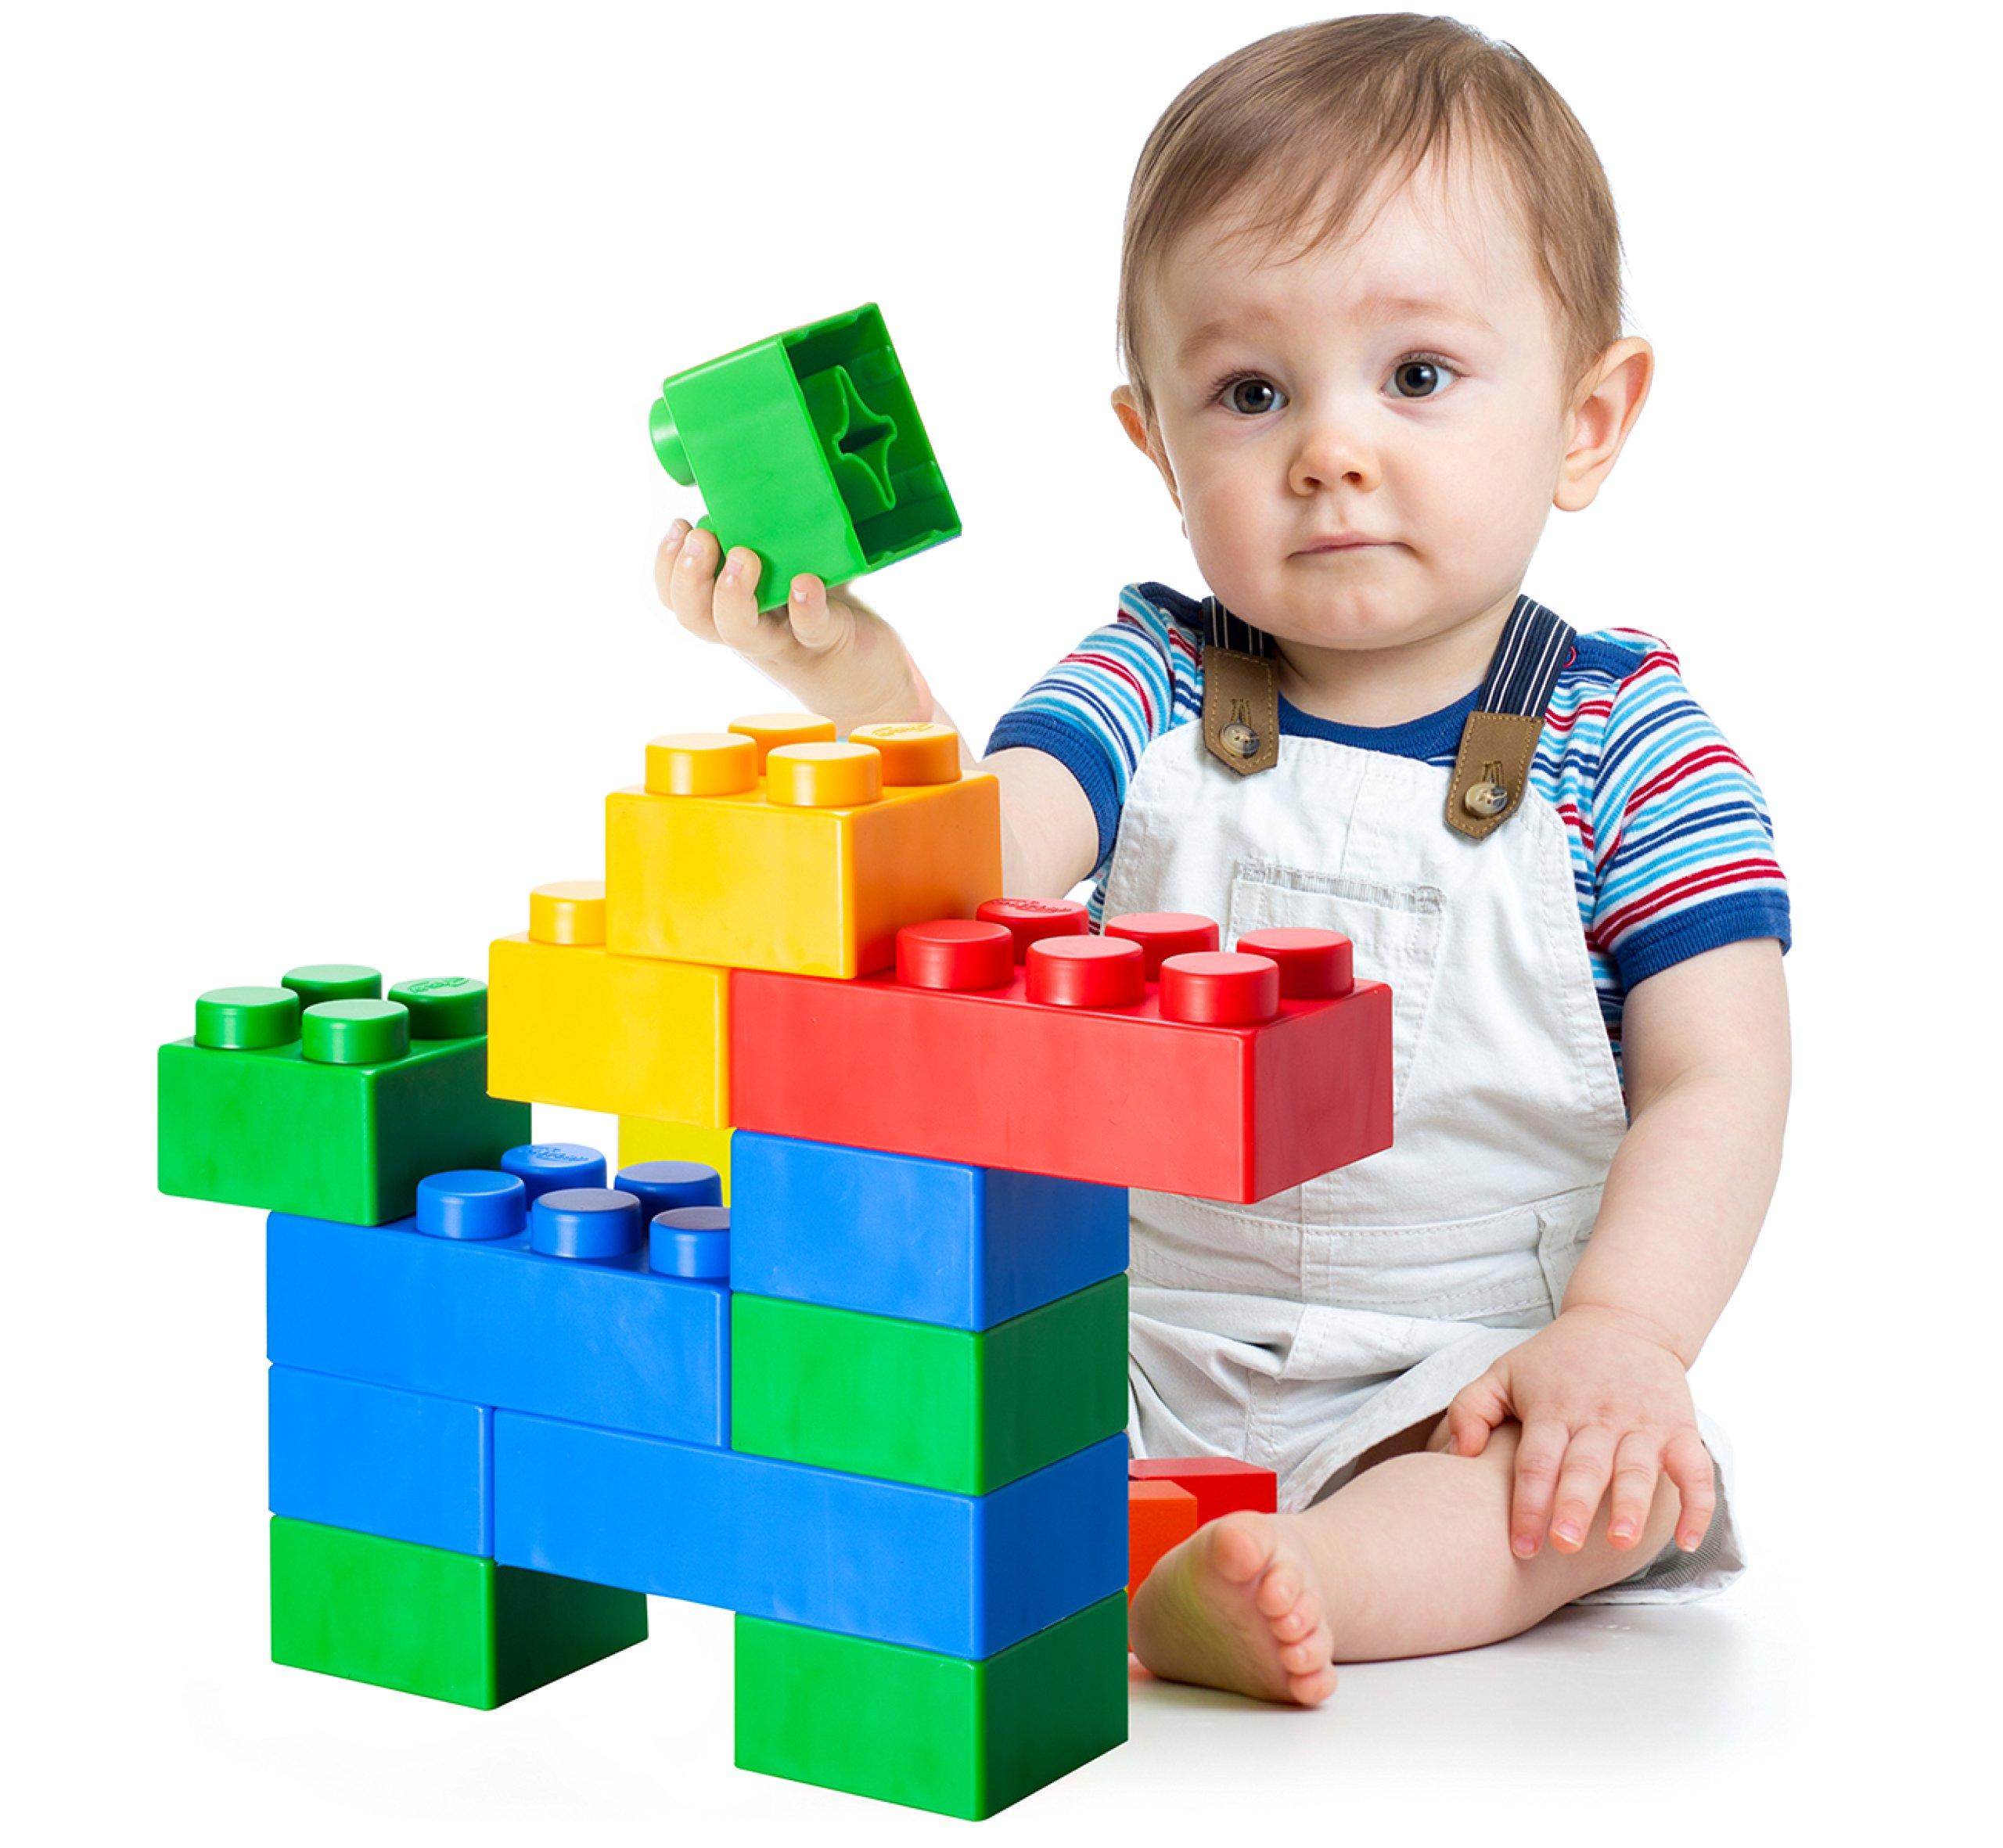 UNiPLAY Jumbo Soft Building Blocks - Plump Series (36pcs), Educational Creative Toys, Food Grade Material(Antibacterial), Non-Toxic, BPA Free, 100%Safe Kids, Toddlers, Baby, Preschoolers